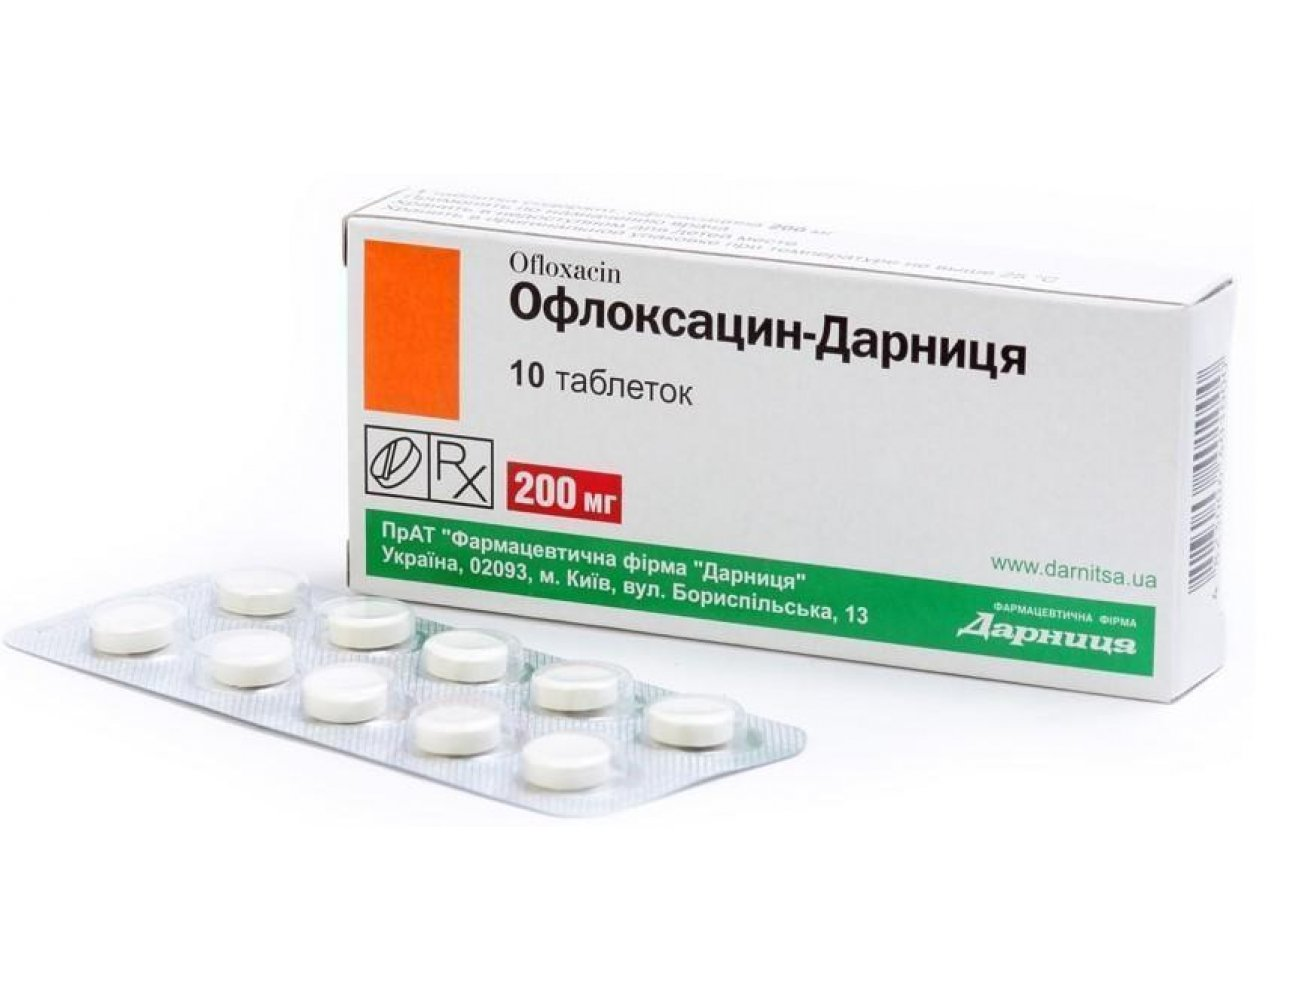 Ofloxacin (ofloxacin) tablets 0.2 №10